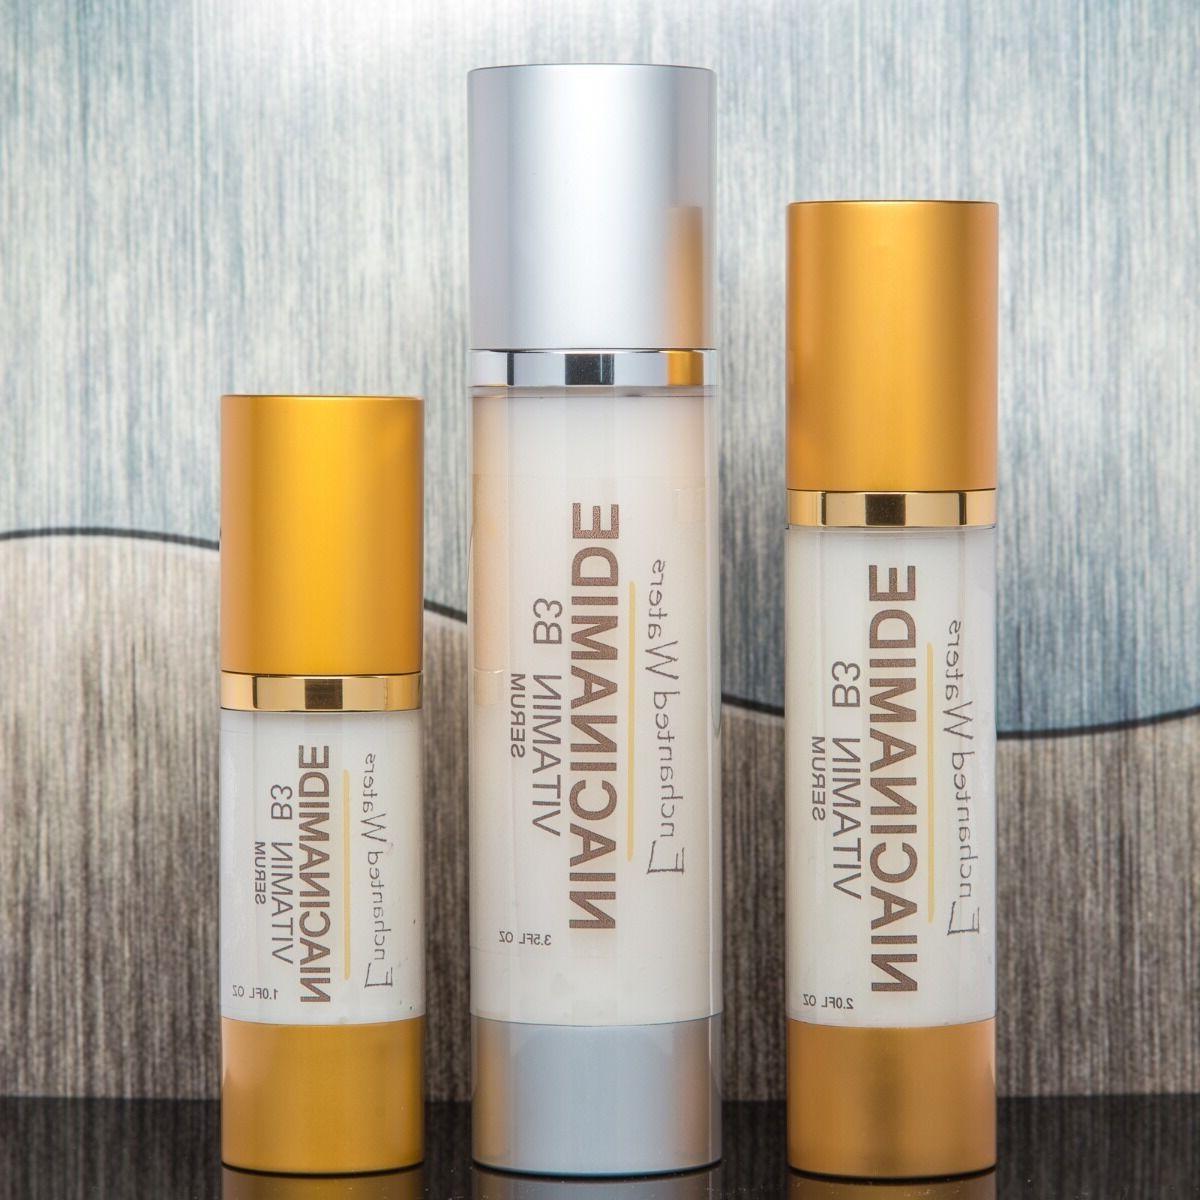 niacinamide vitamin b3 serum cream with hyaluronic